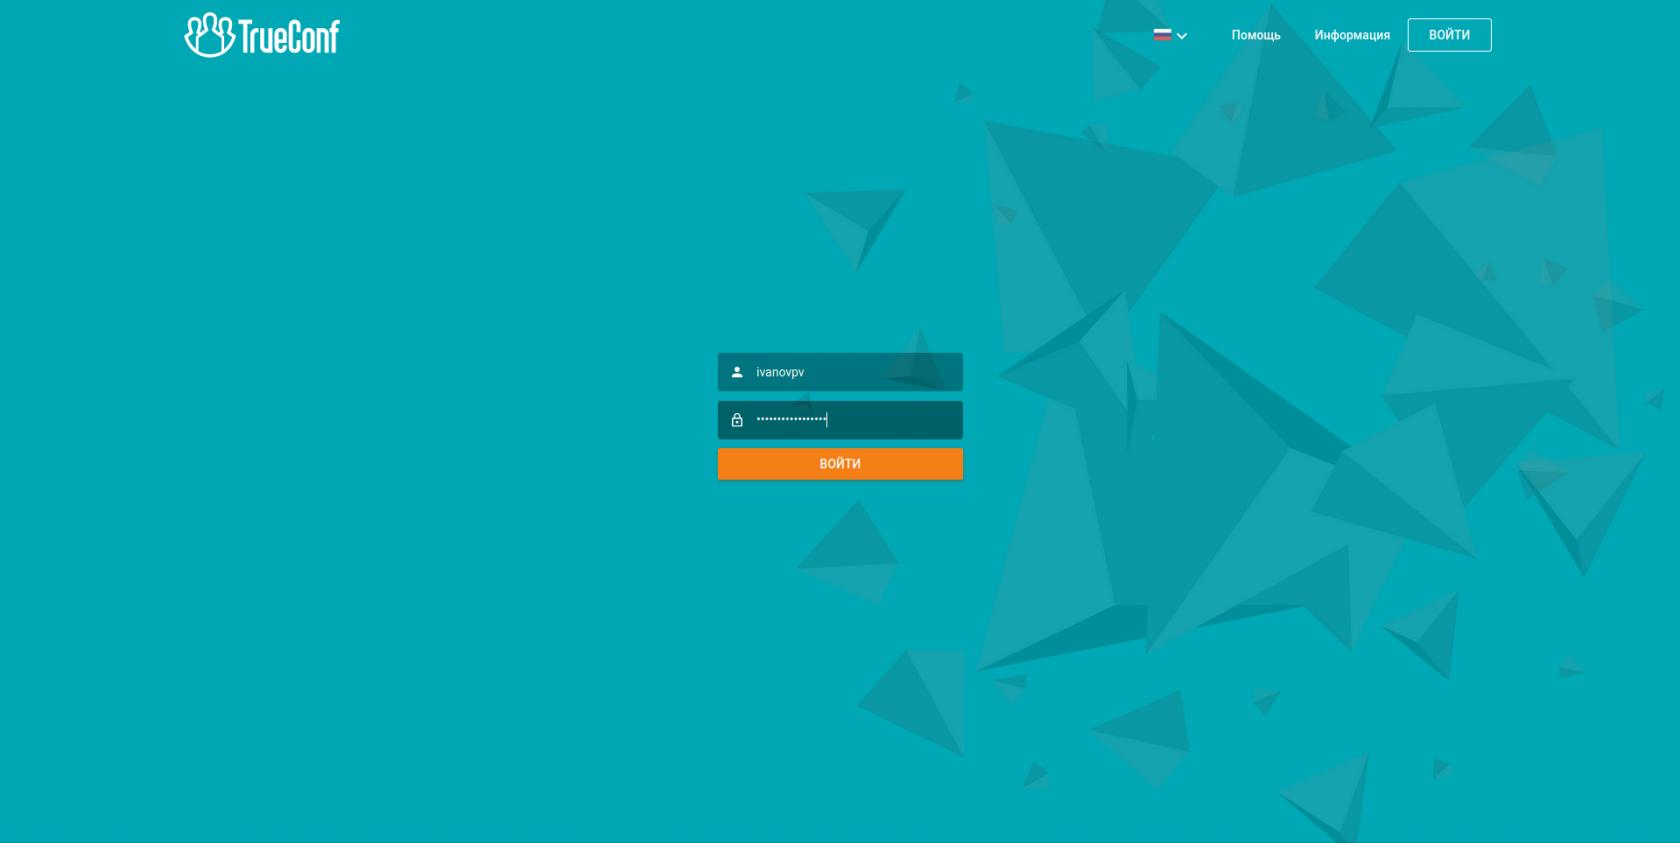 Screenshot_20200326_112619.png